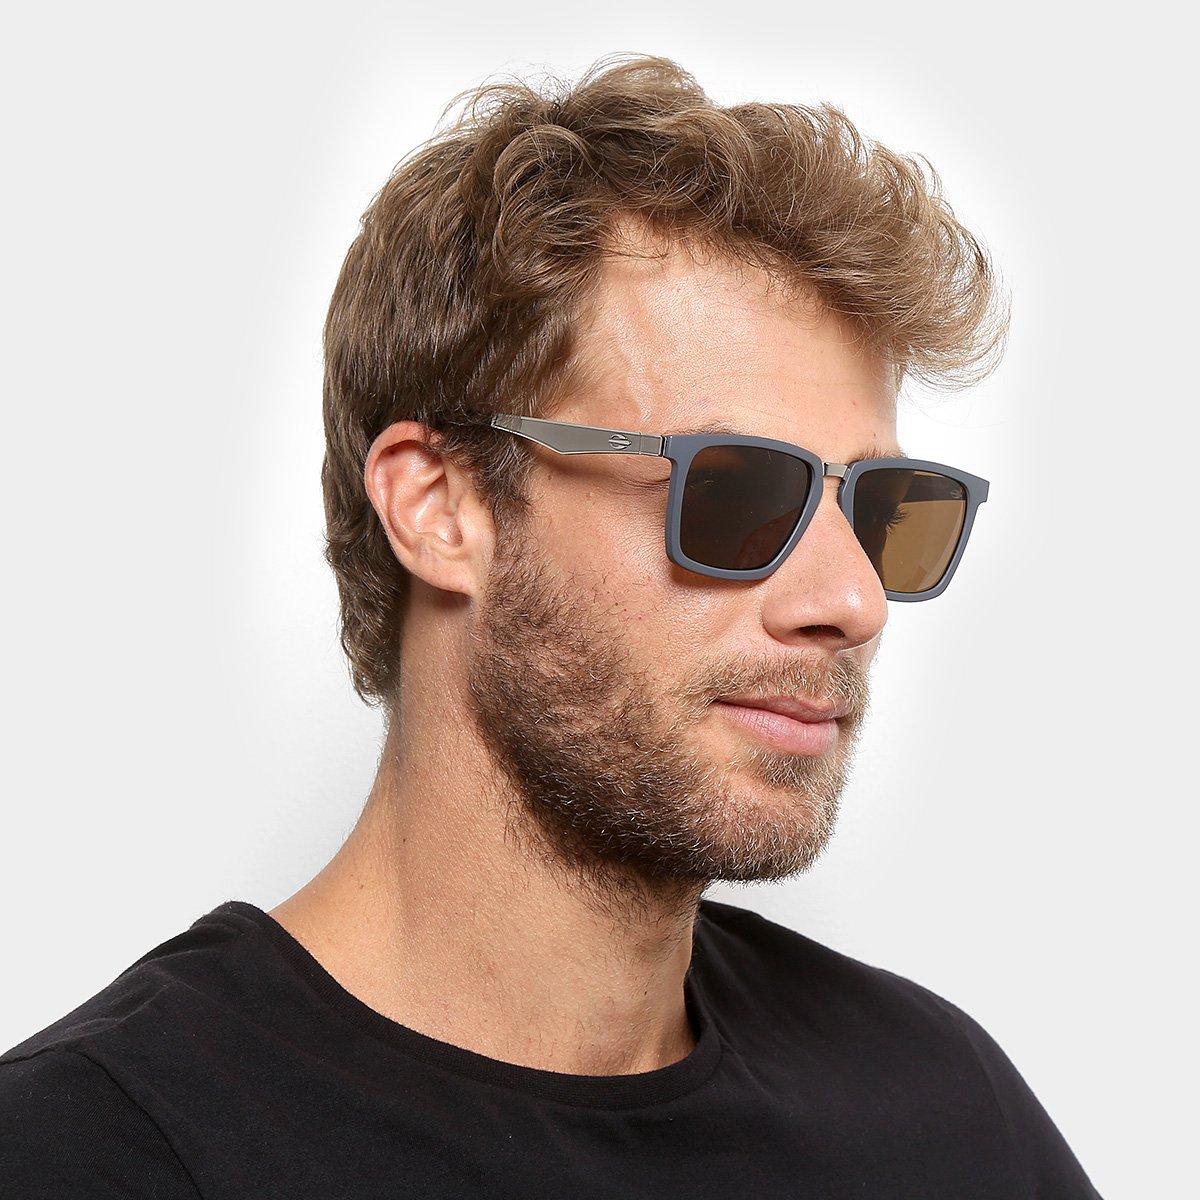 9697f9bc6e9ae Óculos de Sol Mormaii San Luiz M0061DB602 Masculino - Compre Agora ...